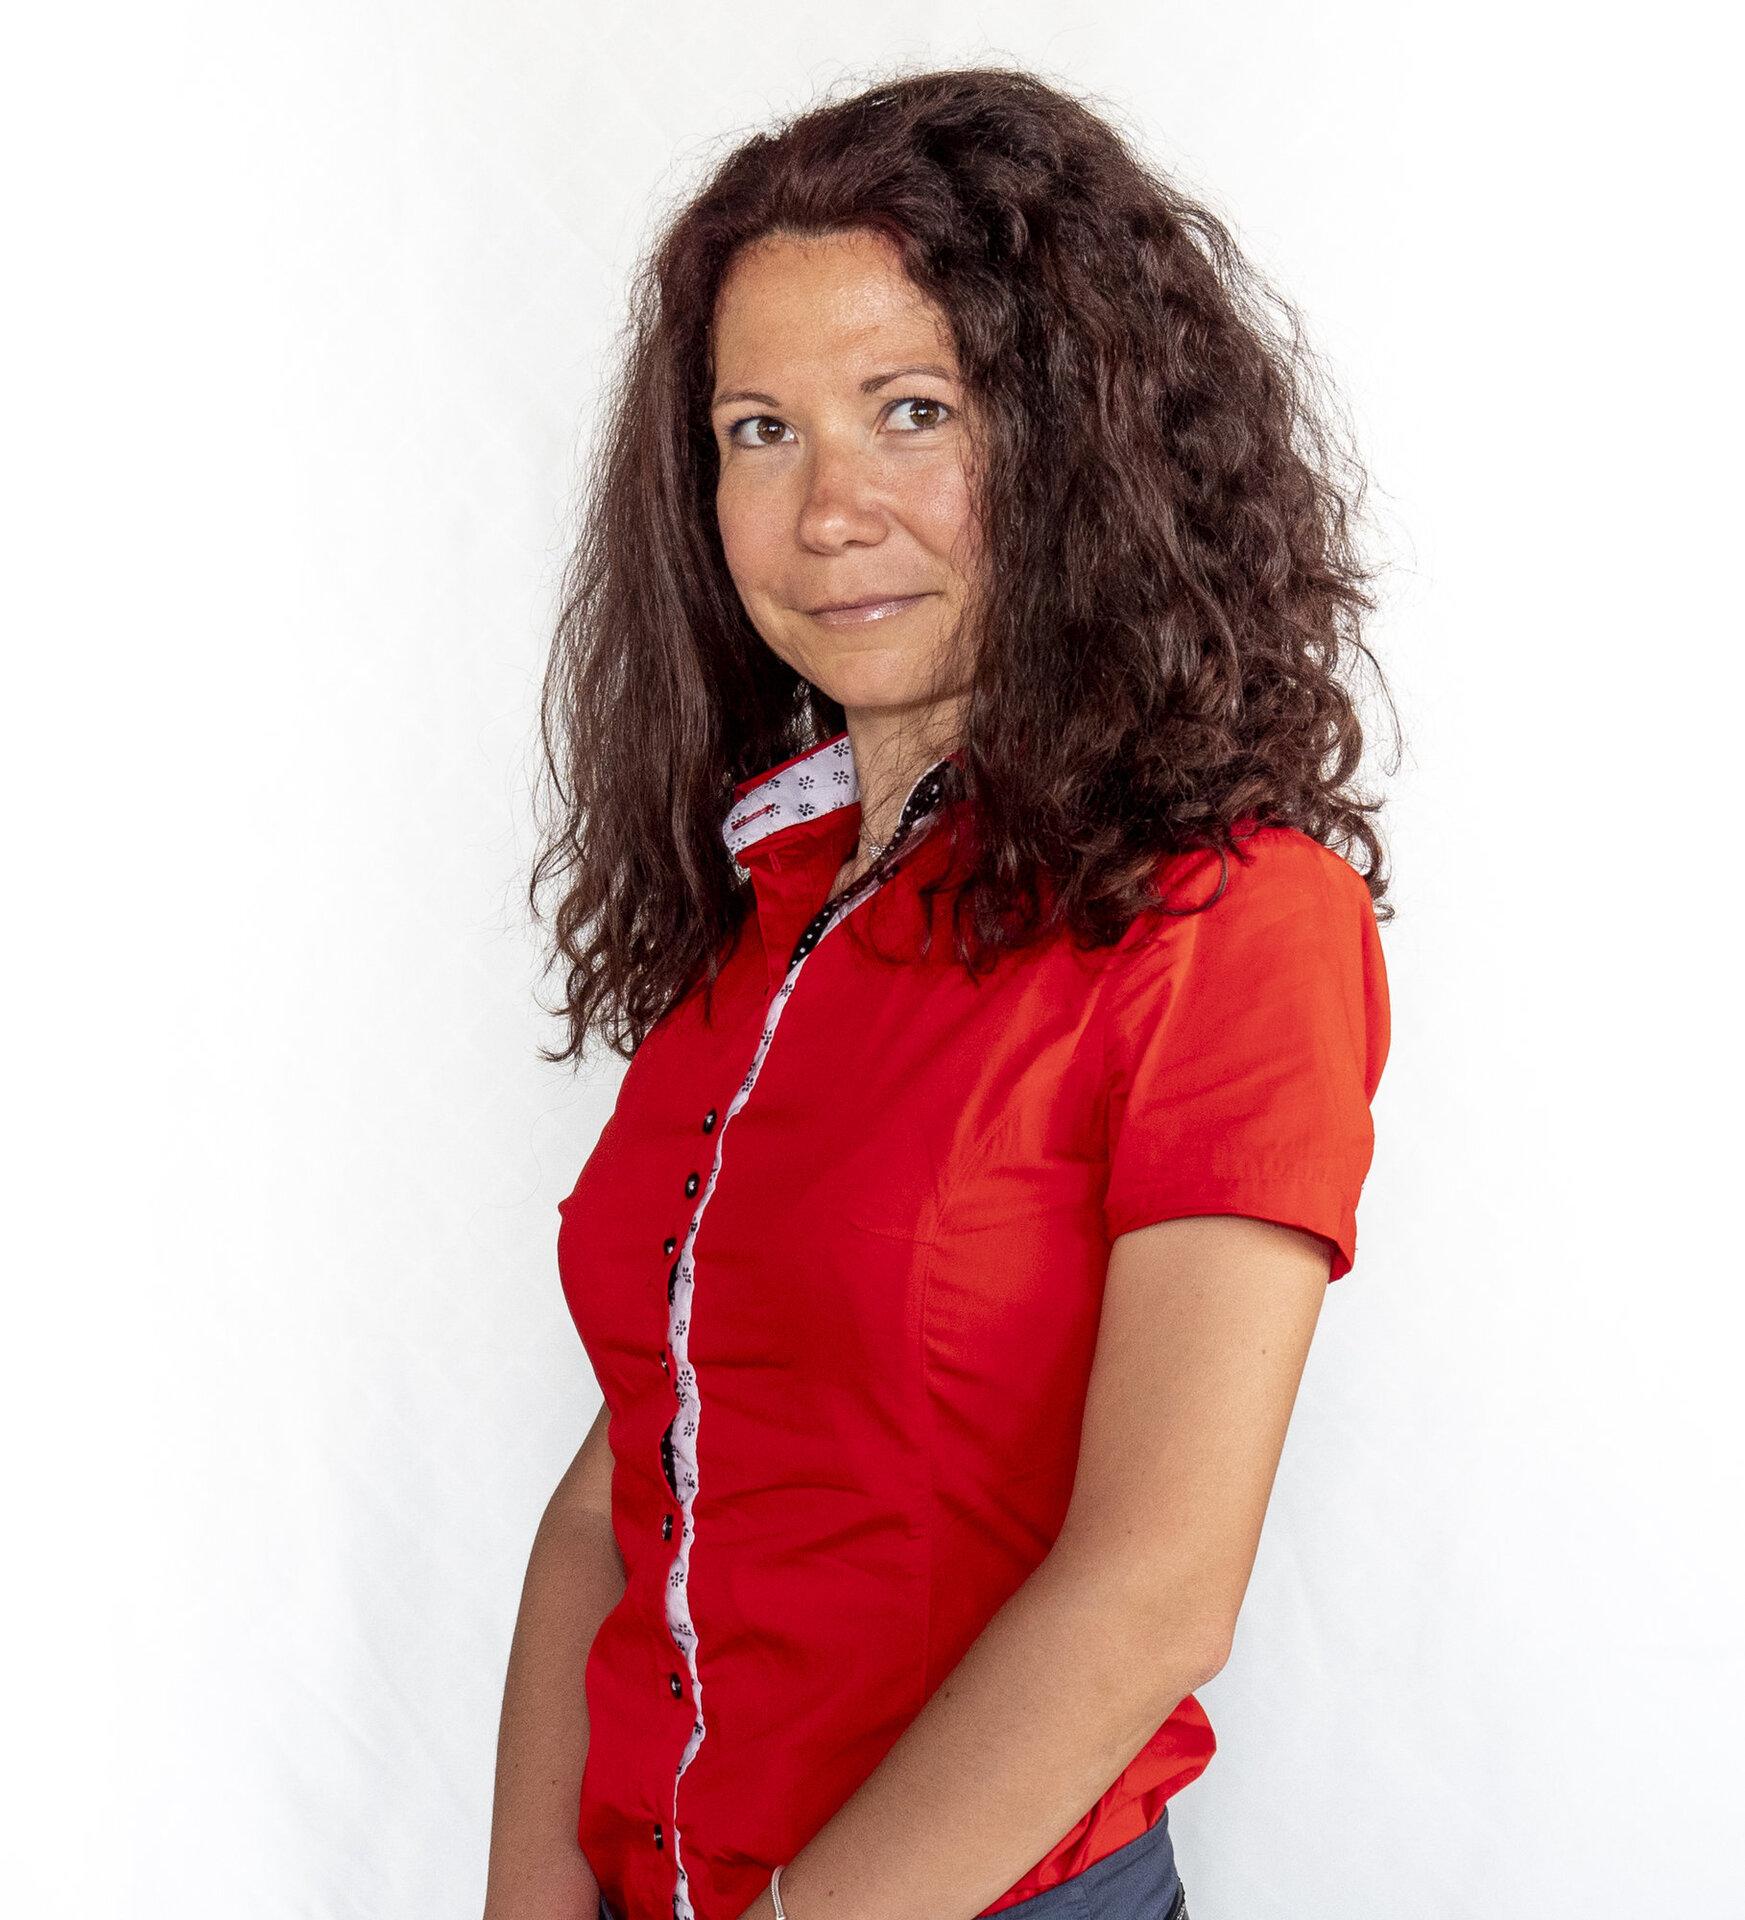 Venelina Pencheva